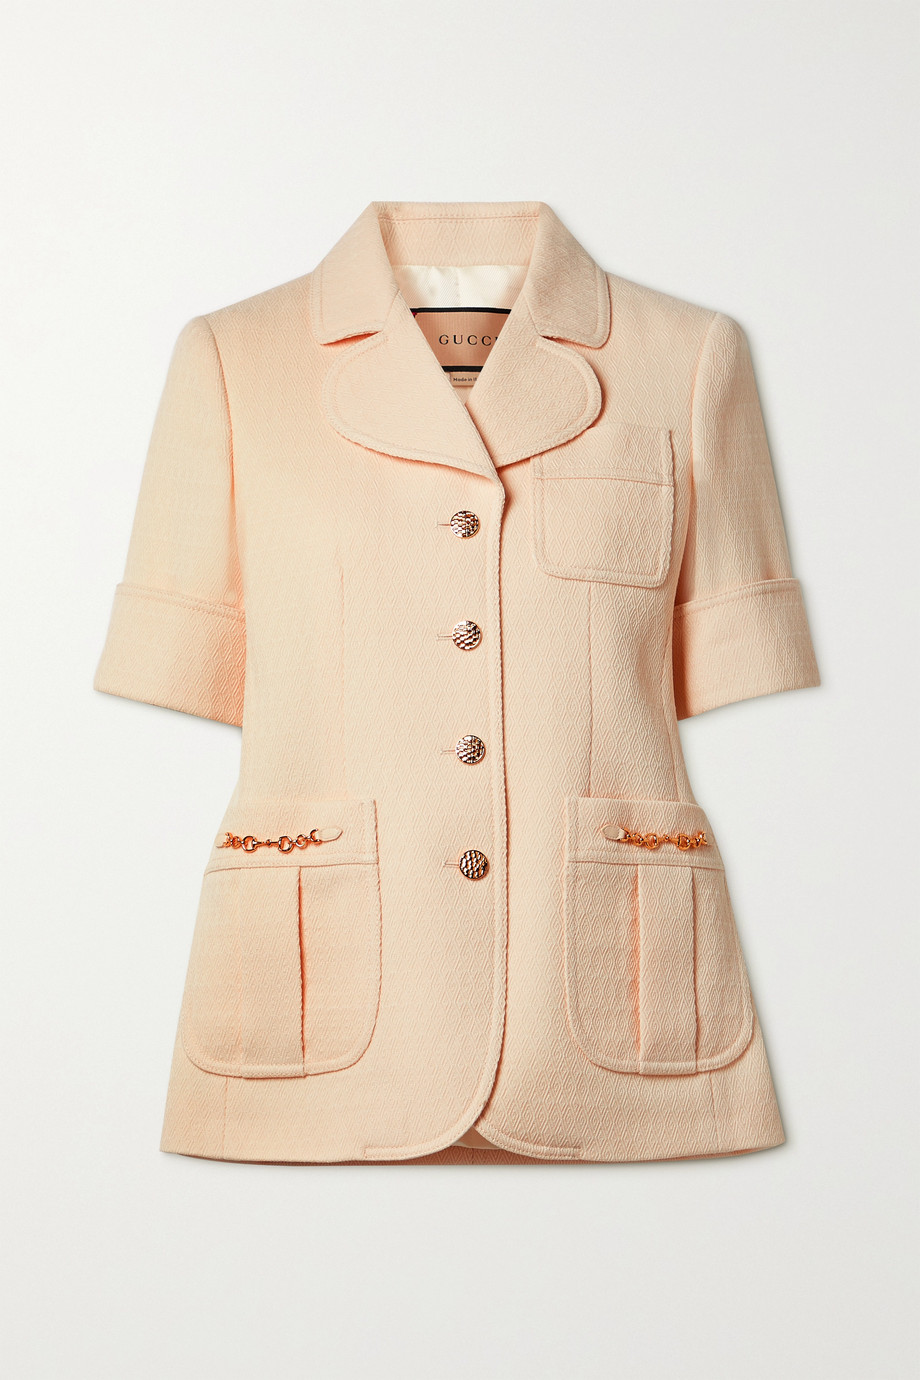 Gucci Horsebit-detailed wool-jacquard jacket